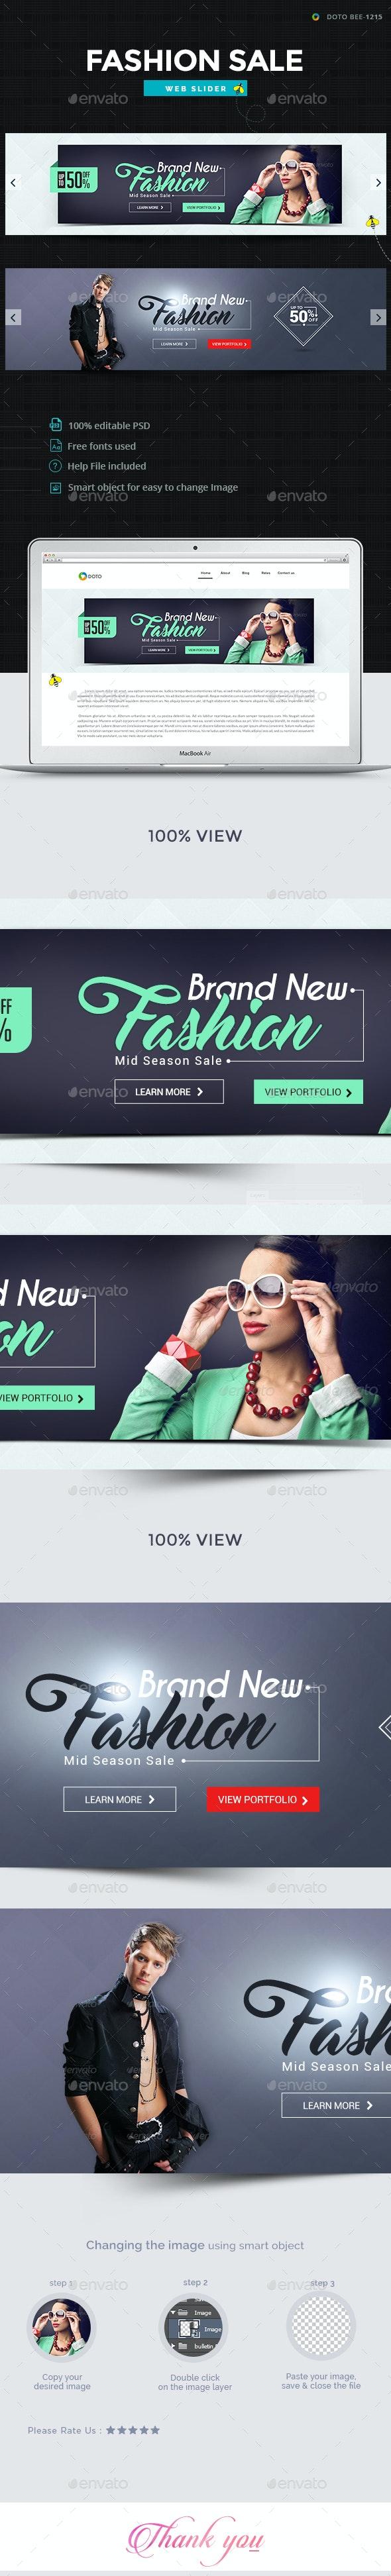 Fashion Sale Sliders - 2 Designs - Sliders & Features Web Elements